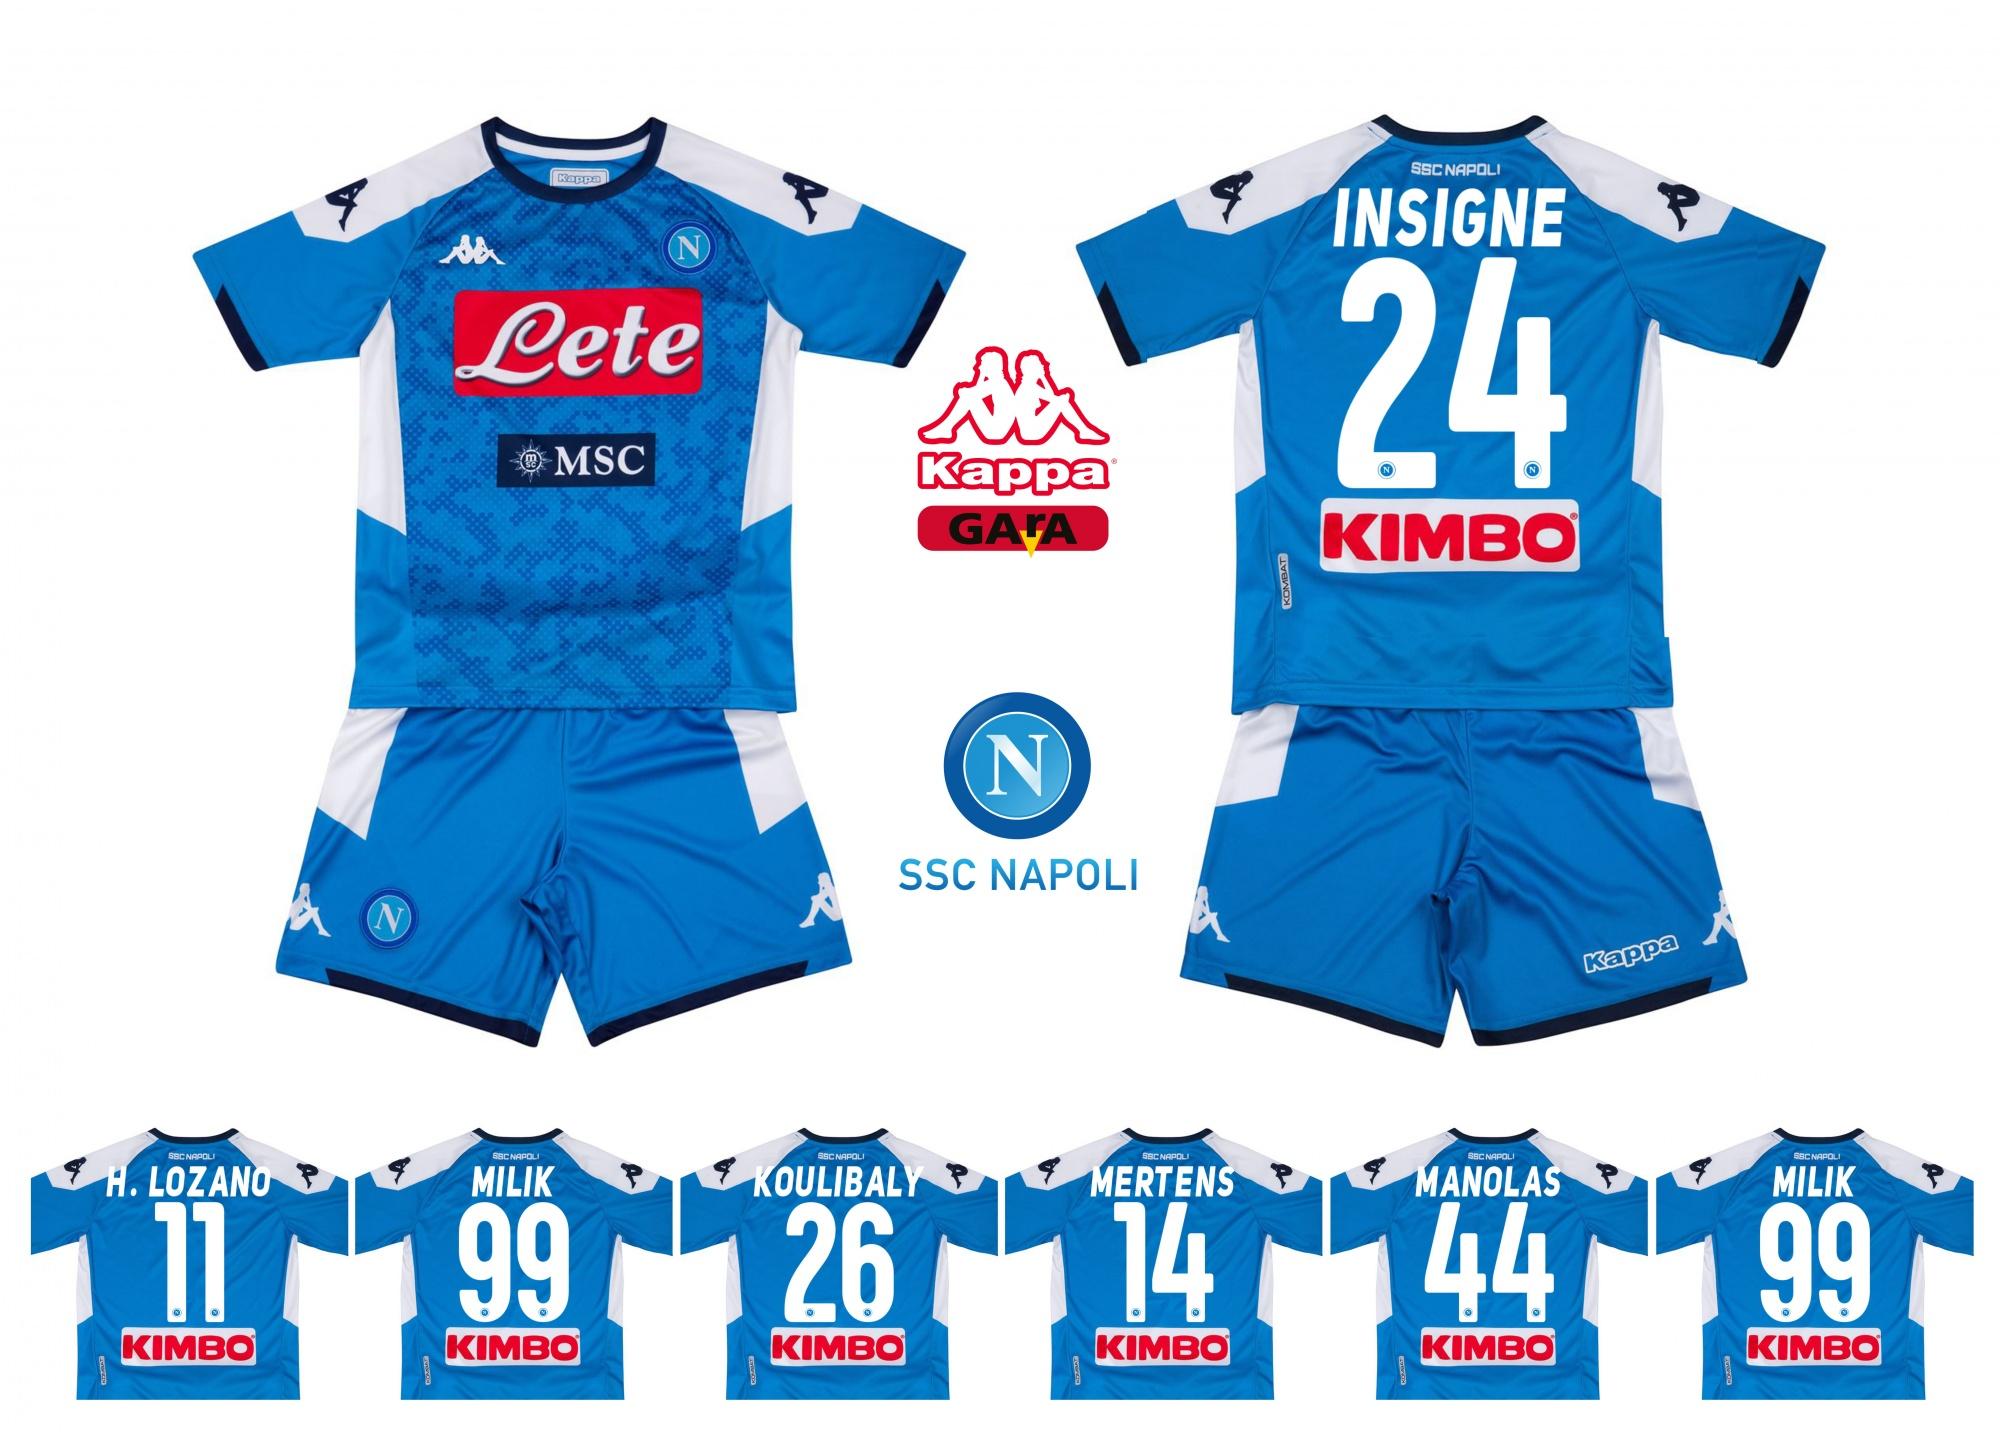 1 Maglia Ssc Napoli 2020 Maradona Kappa Ufficiale per adulti